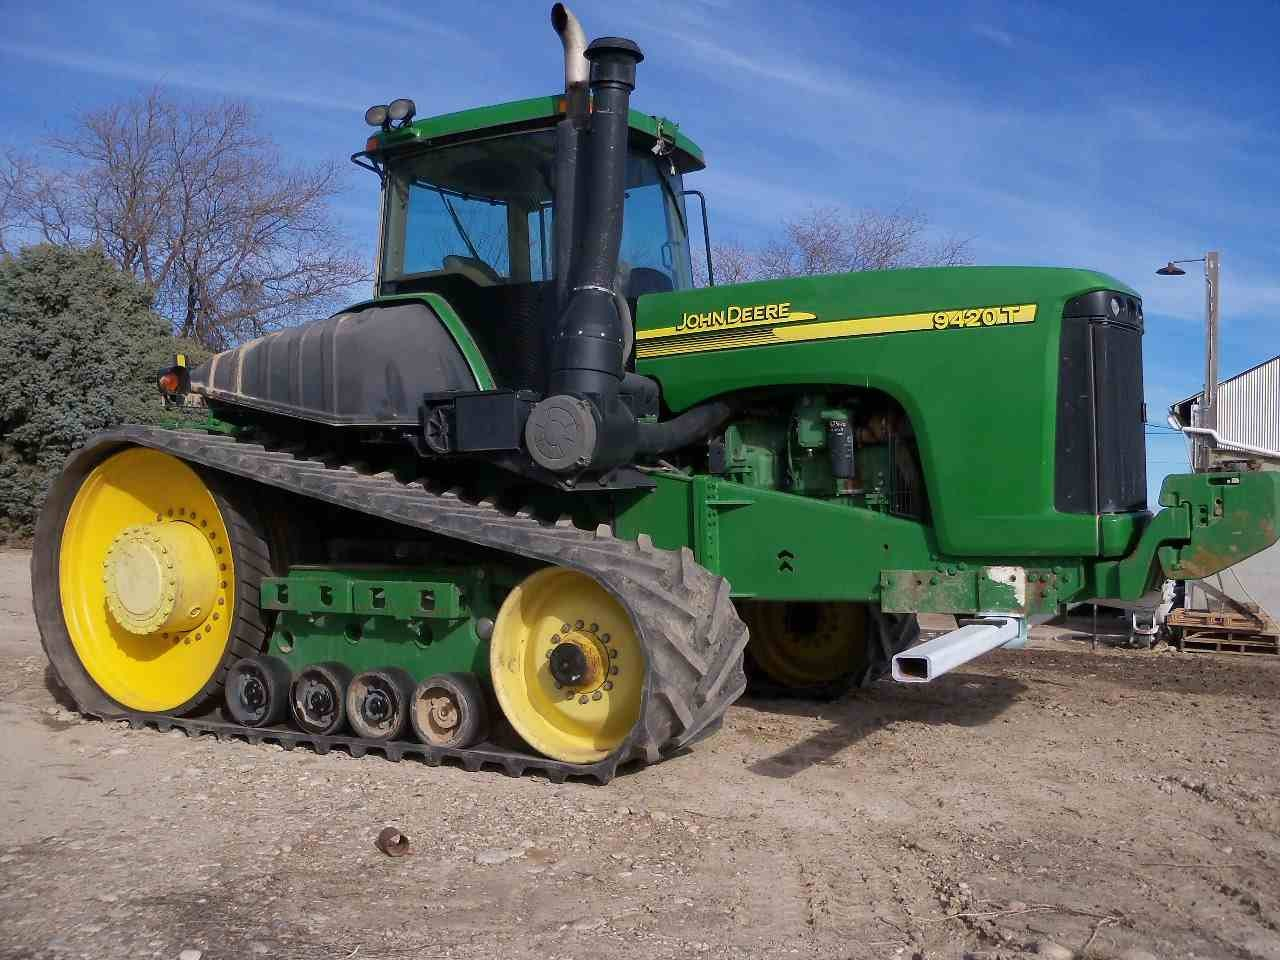 John Deere 9420T Tractor - 2003 - Berry Machinery